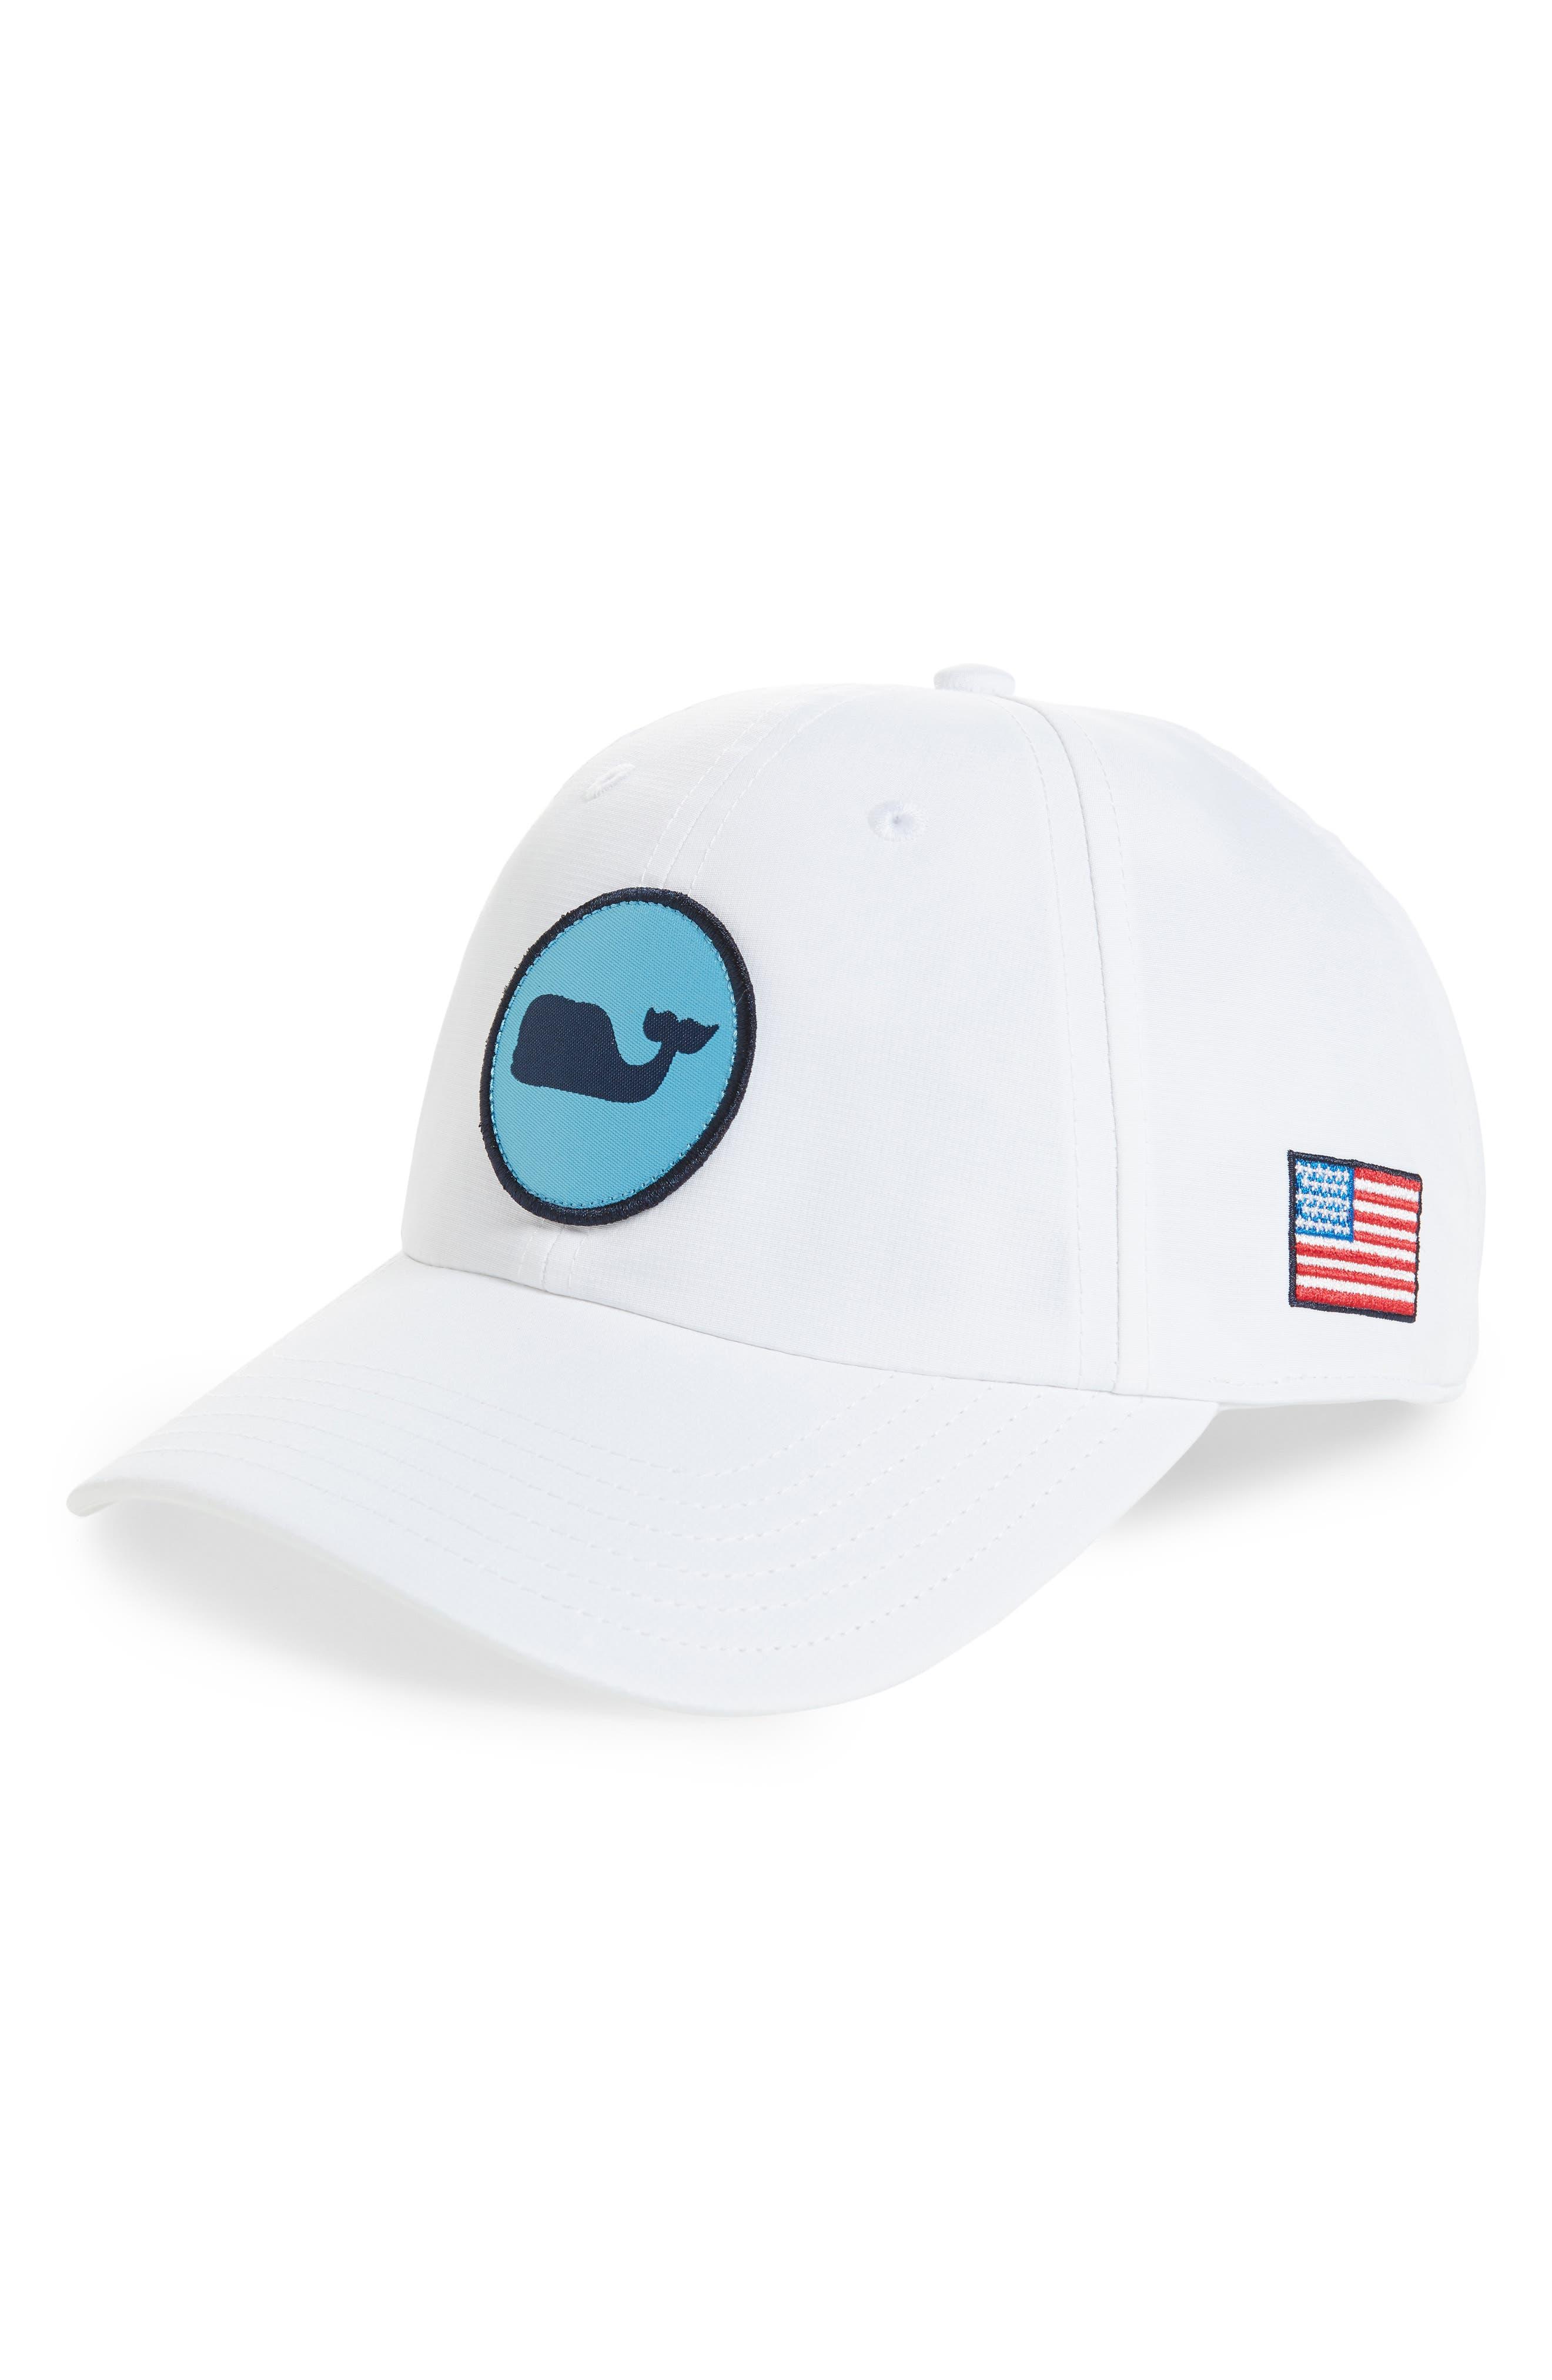 Perf Classic Woven Whale Ball Cap,                             Main thumbnail 1, color,                             White Cap